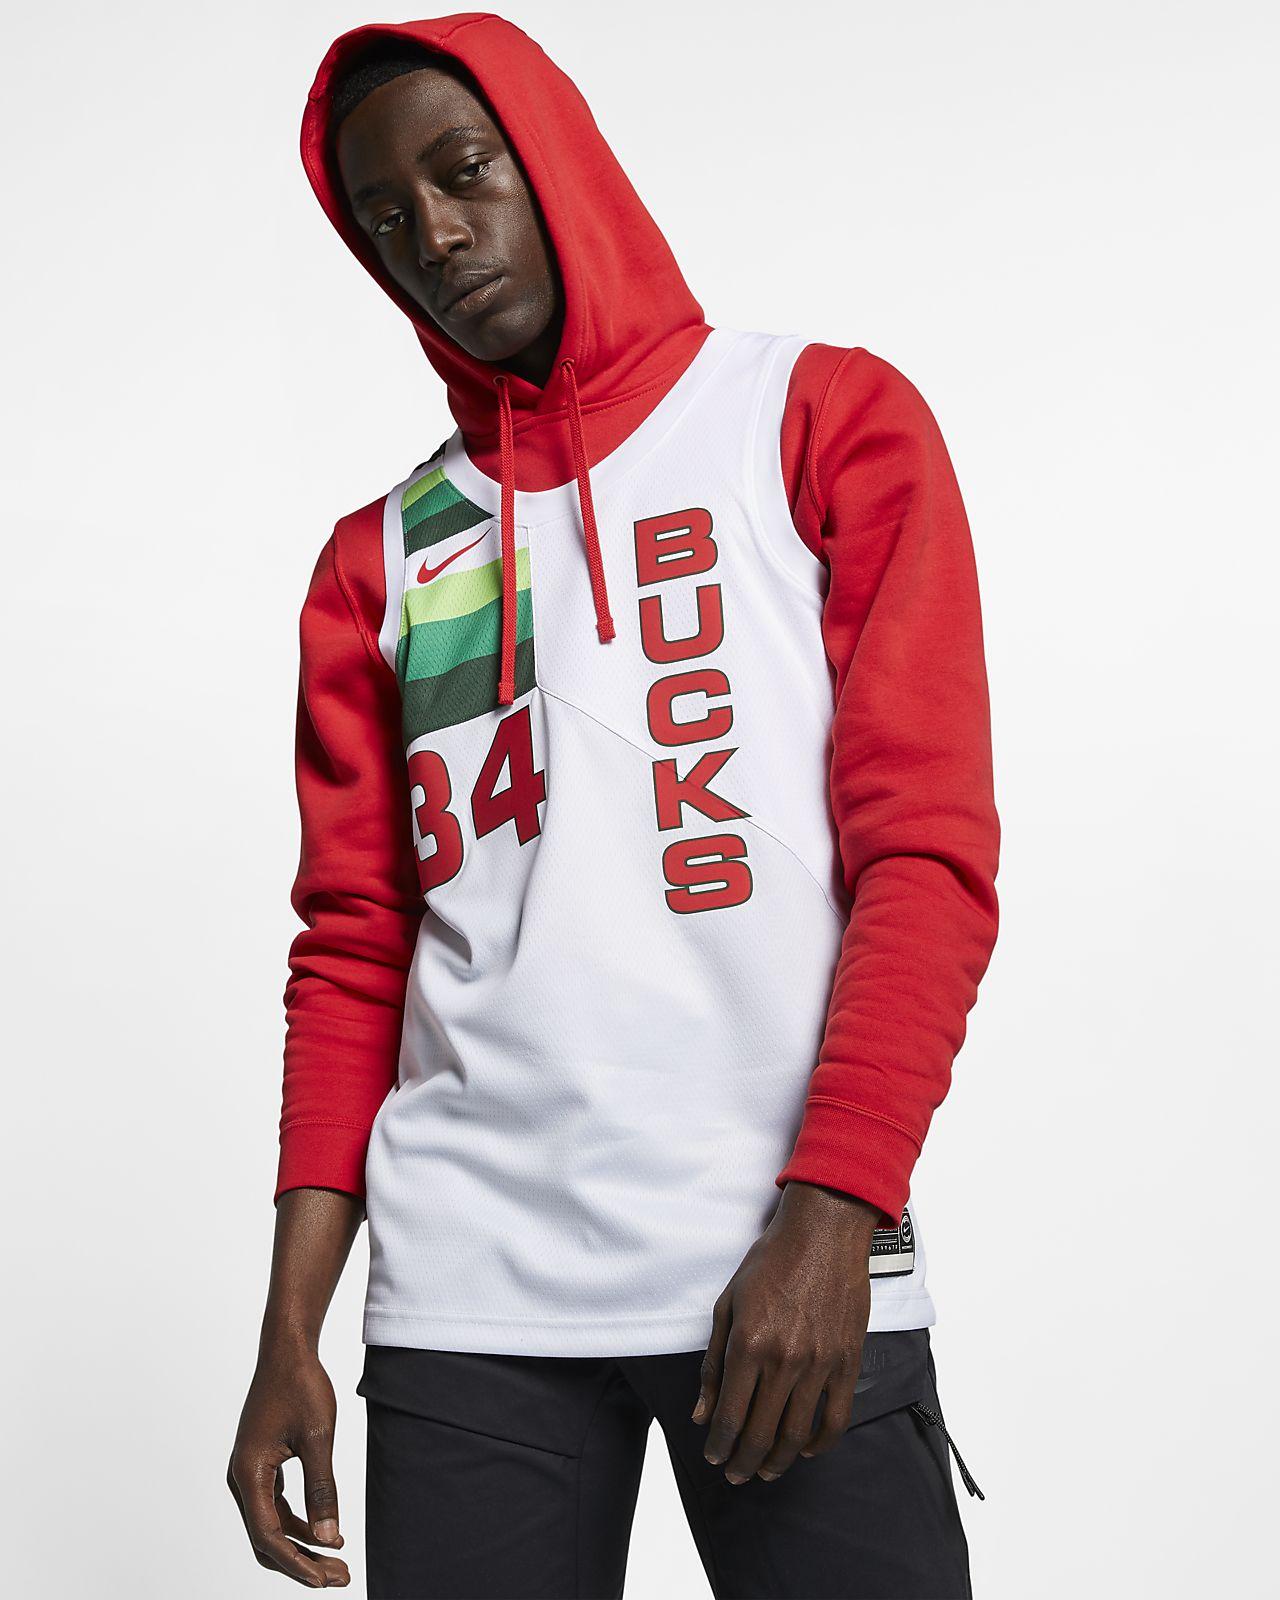 Pánský dres Nike NBA Connected Giannis Antetokounmpo City Edition Swingman (Milwaukee Bucks)